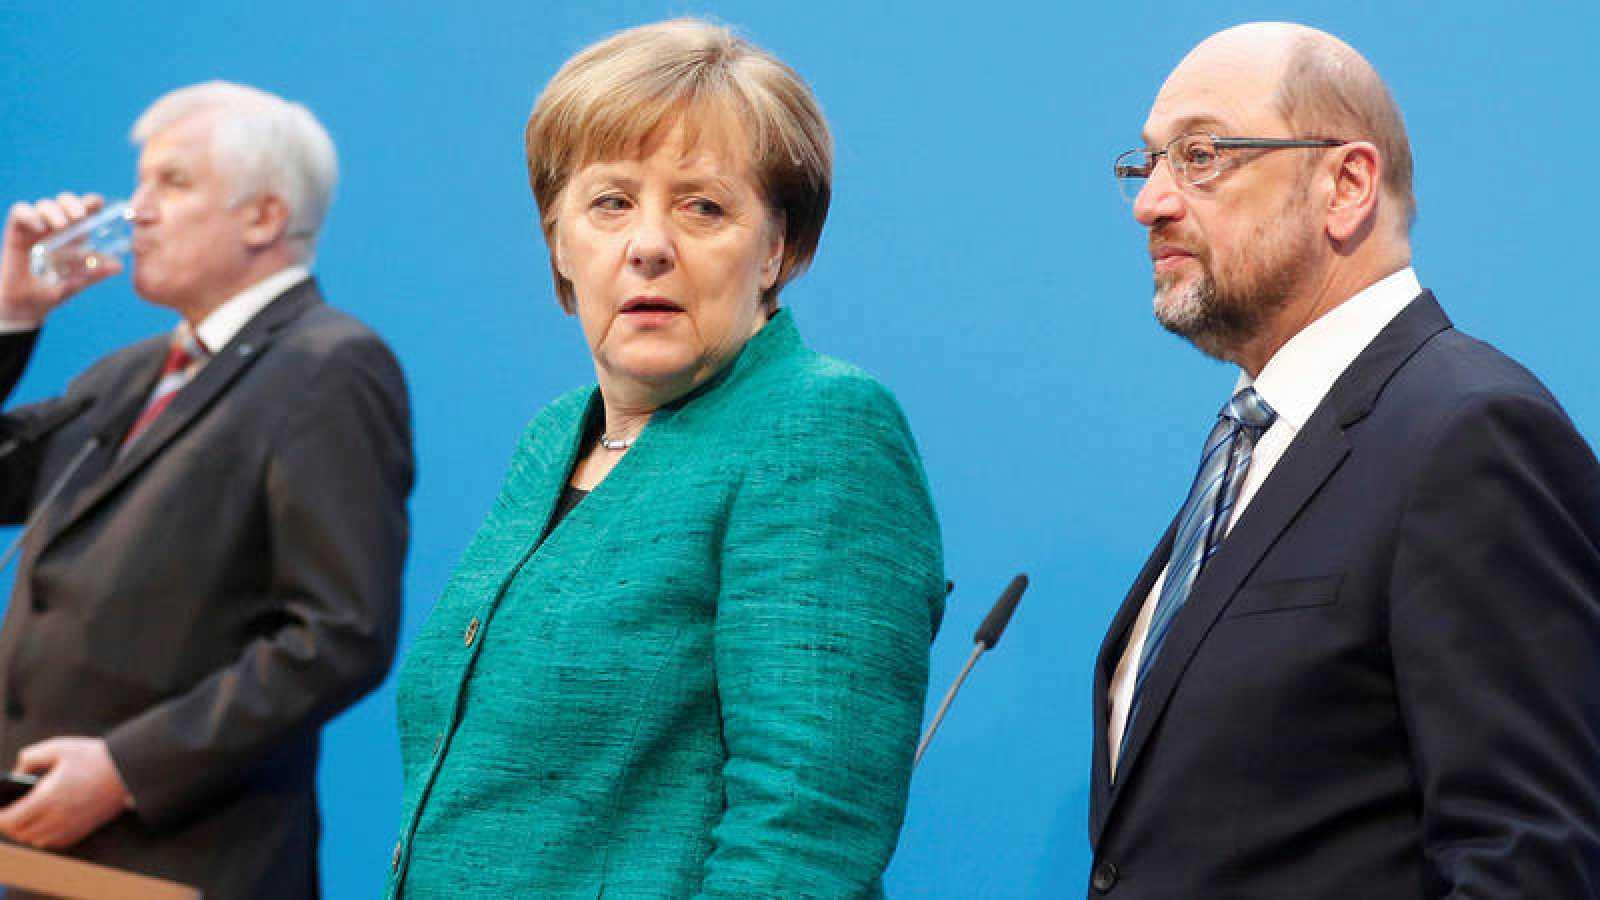 La líder de la conservadora CDU alemana, Angela Merkel, mira a su homólogo socialdemócrata, Martin Schulz